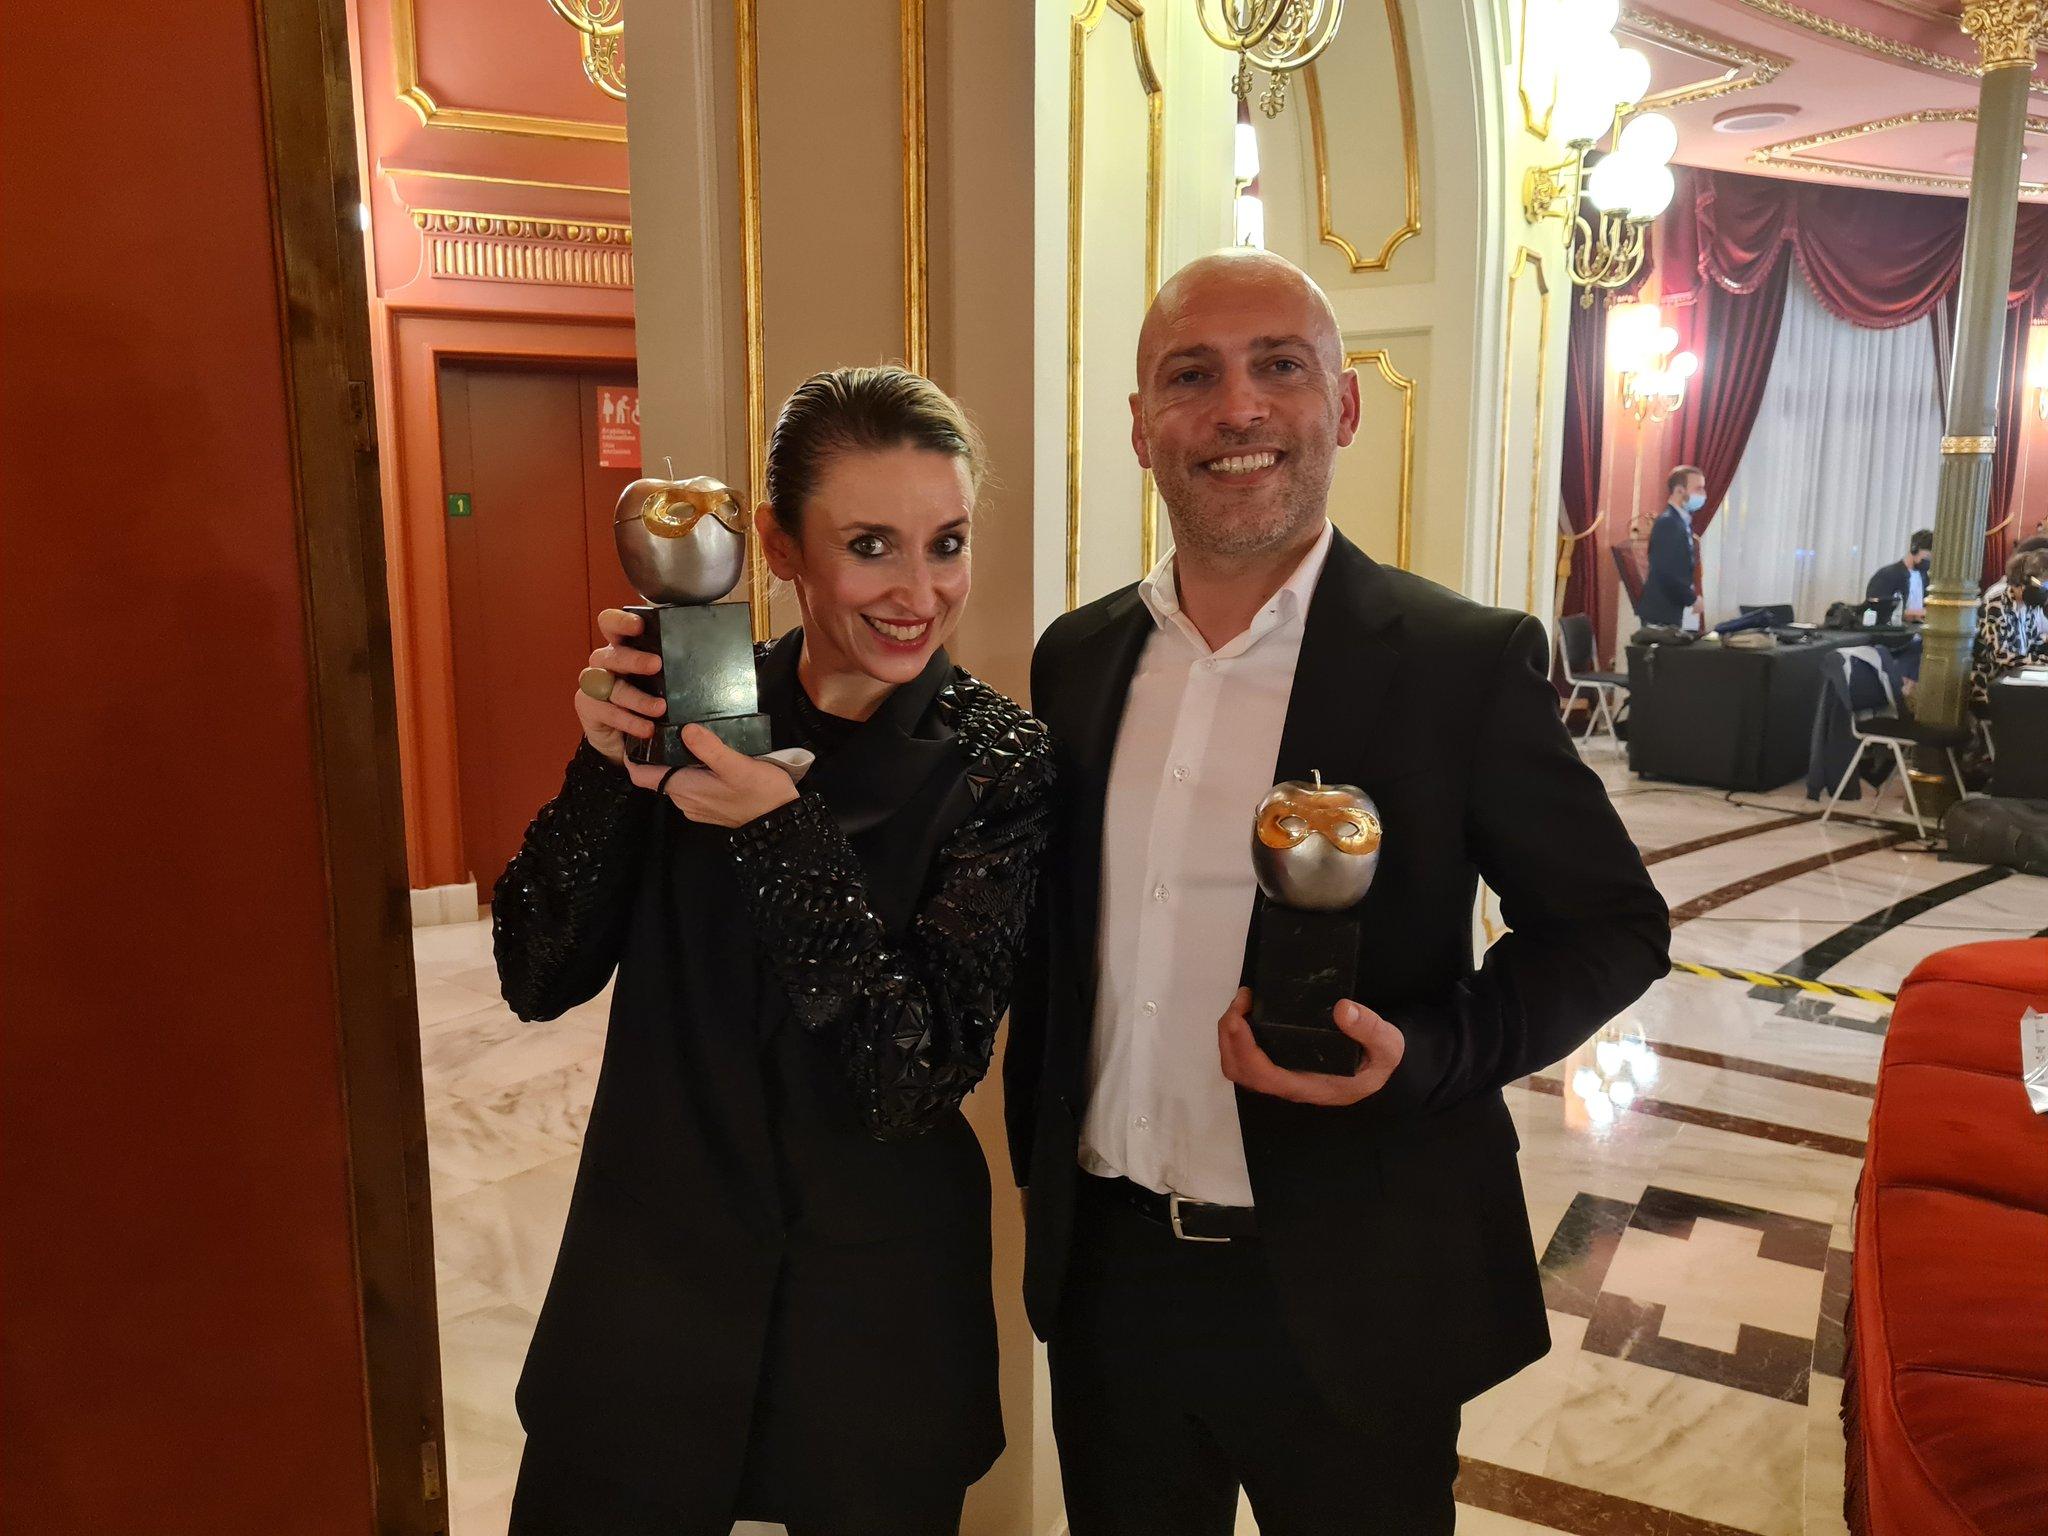 Iratxe Ansa Max - Premios Max con reflejo en Gipuzkoa